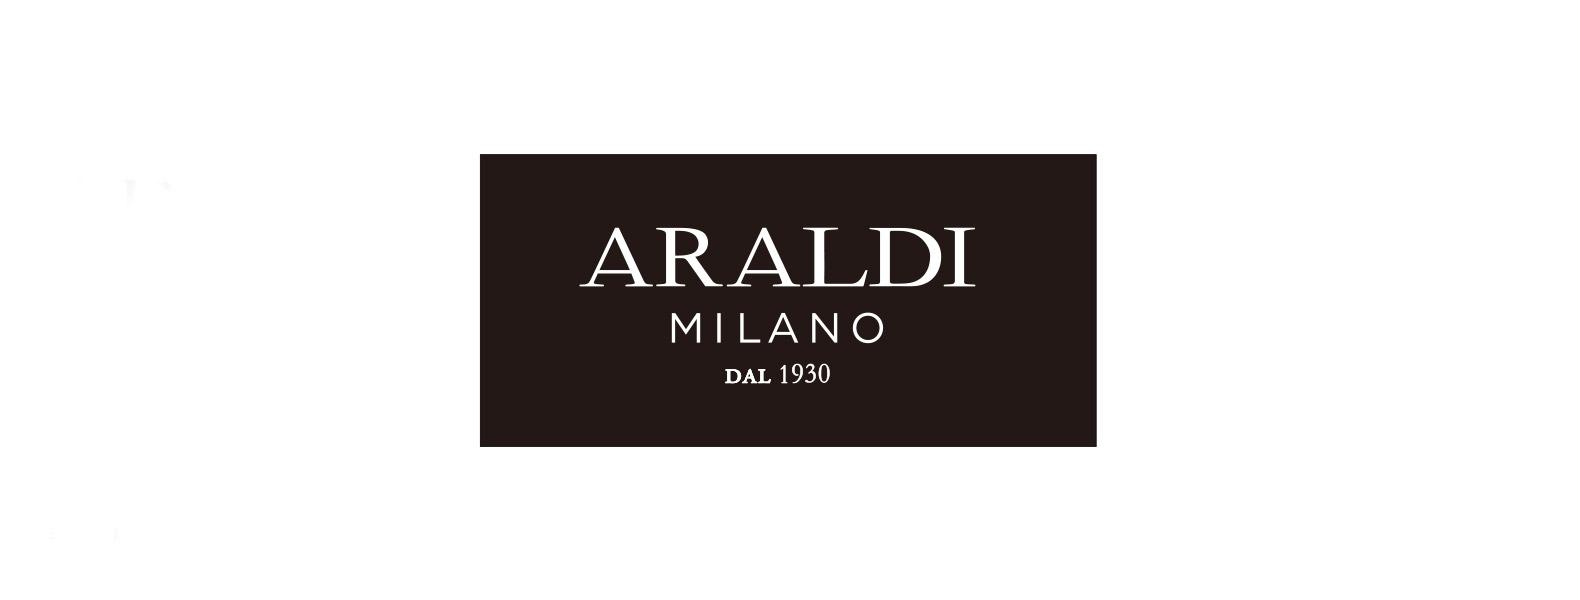 ARALDI 1930